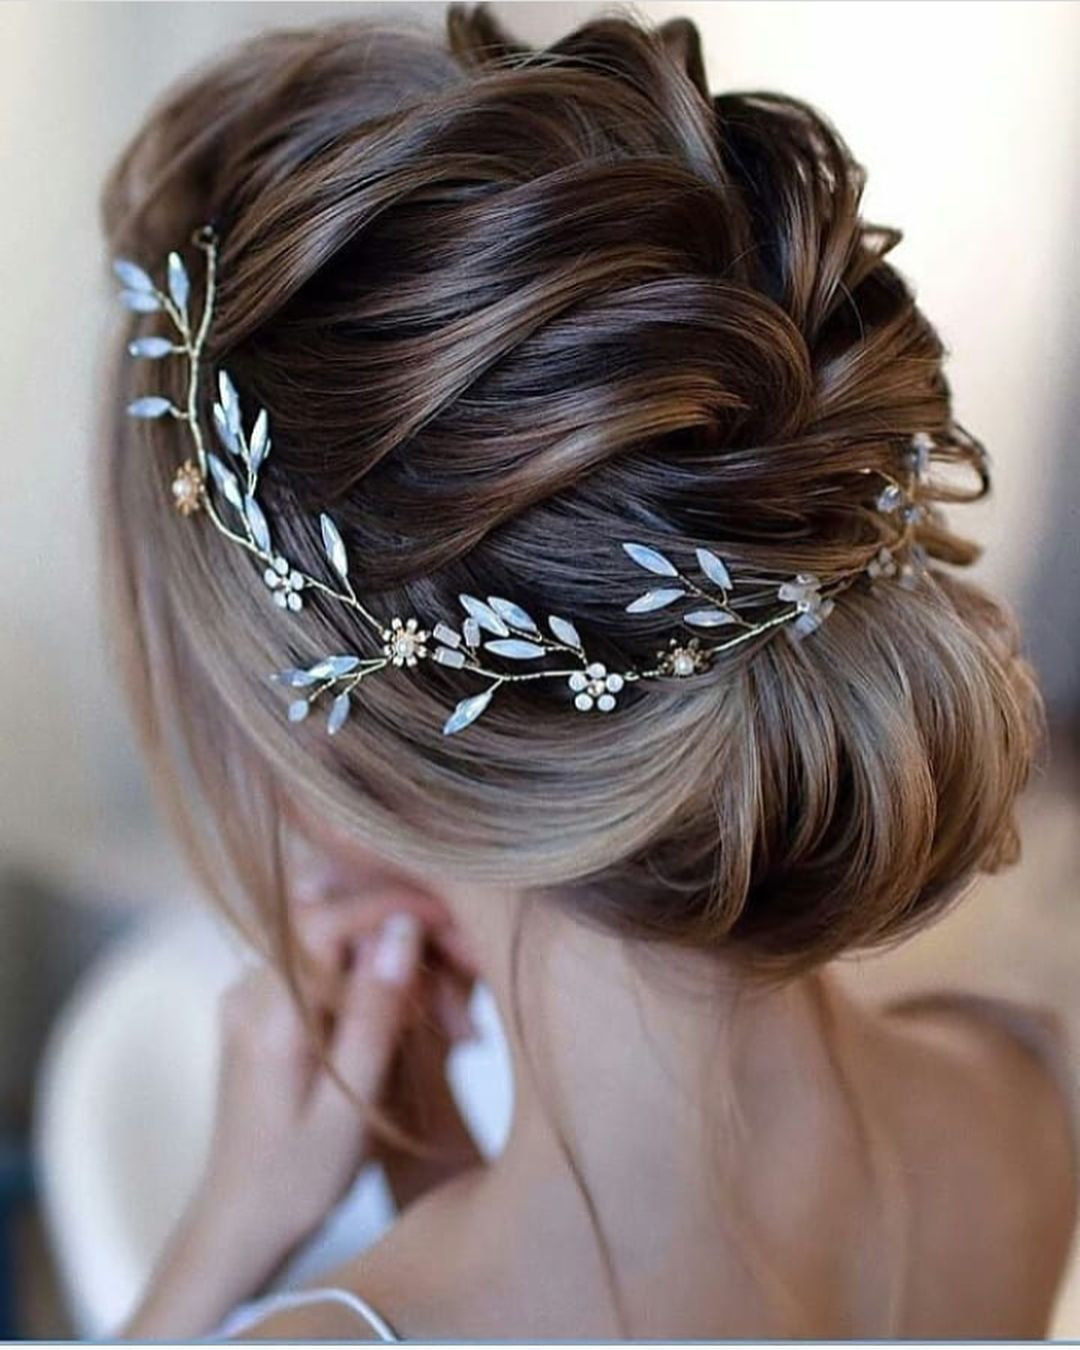 Pin by rachael on hair in pinterest wedding hairstyles